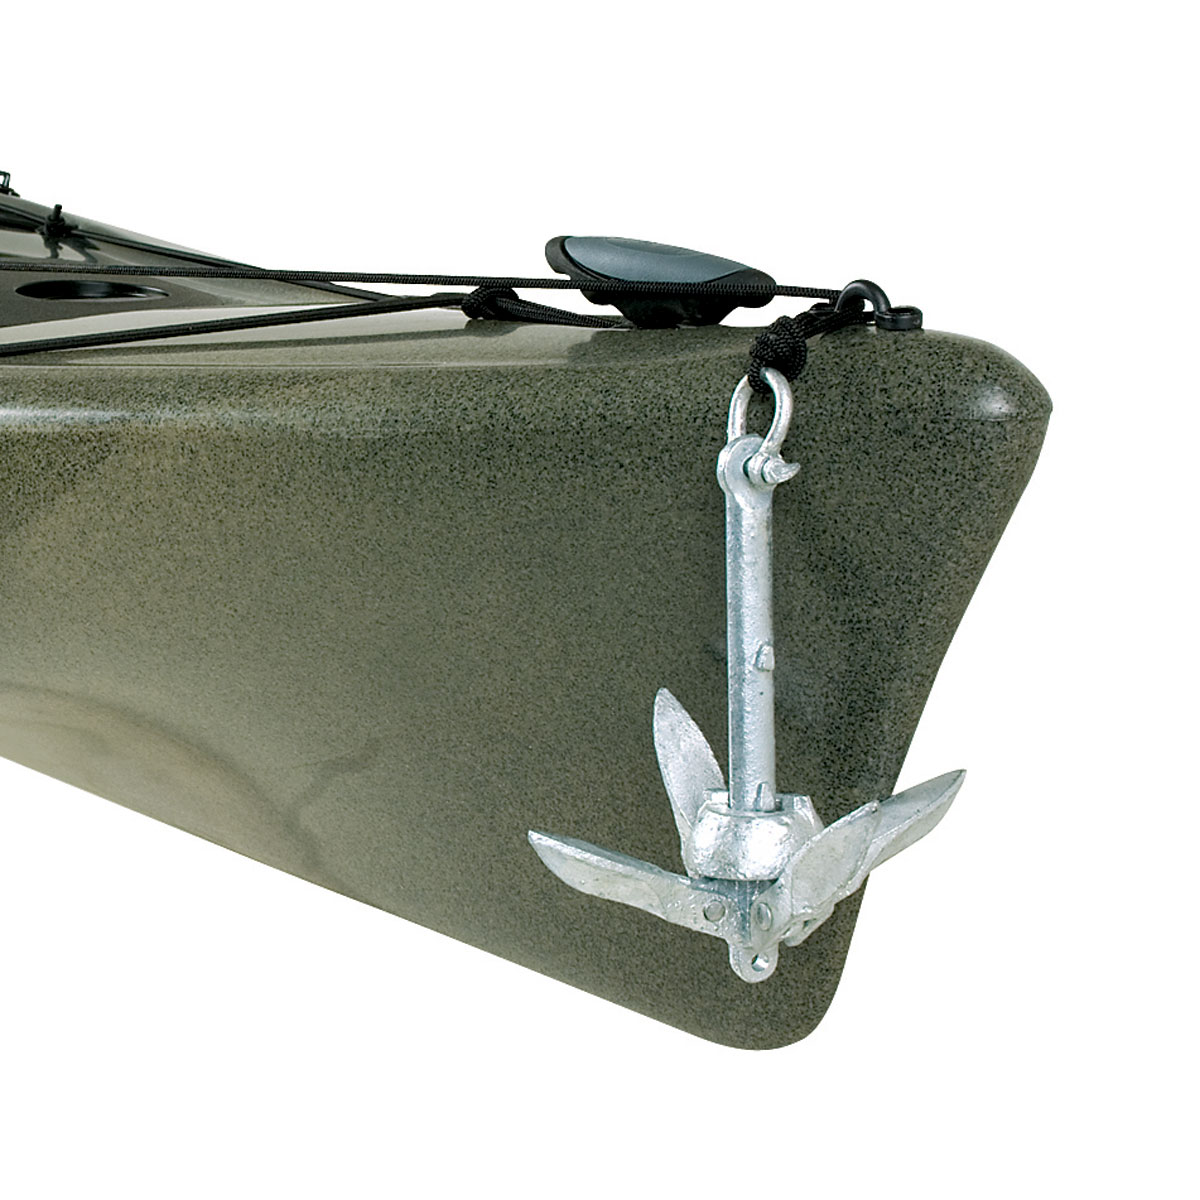 Carlisle Folding Anchor Kit